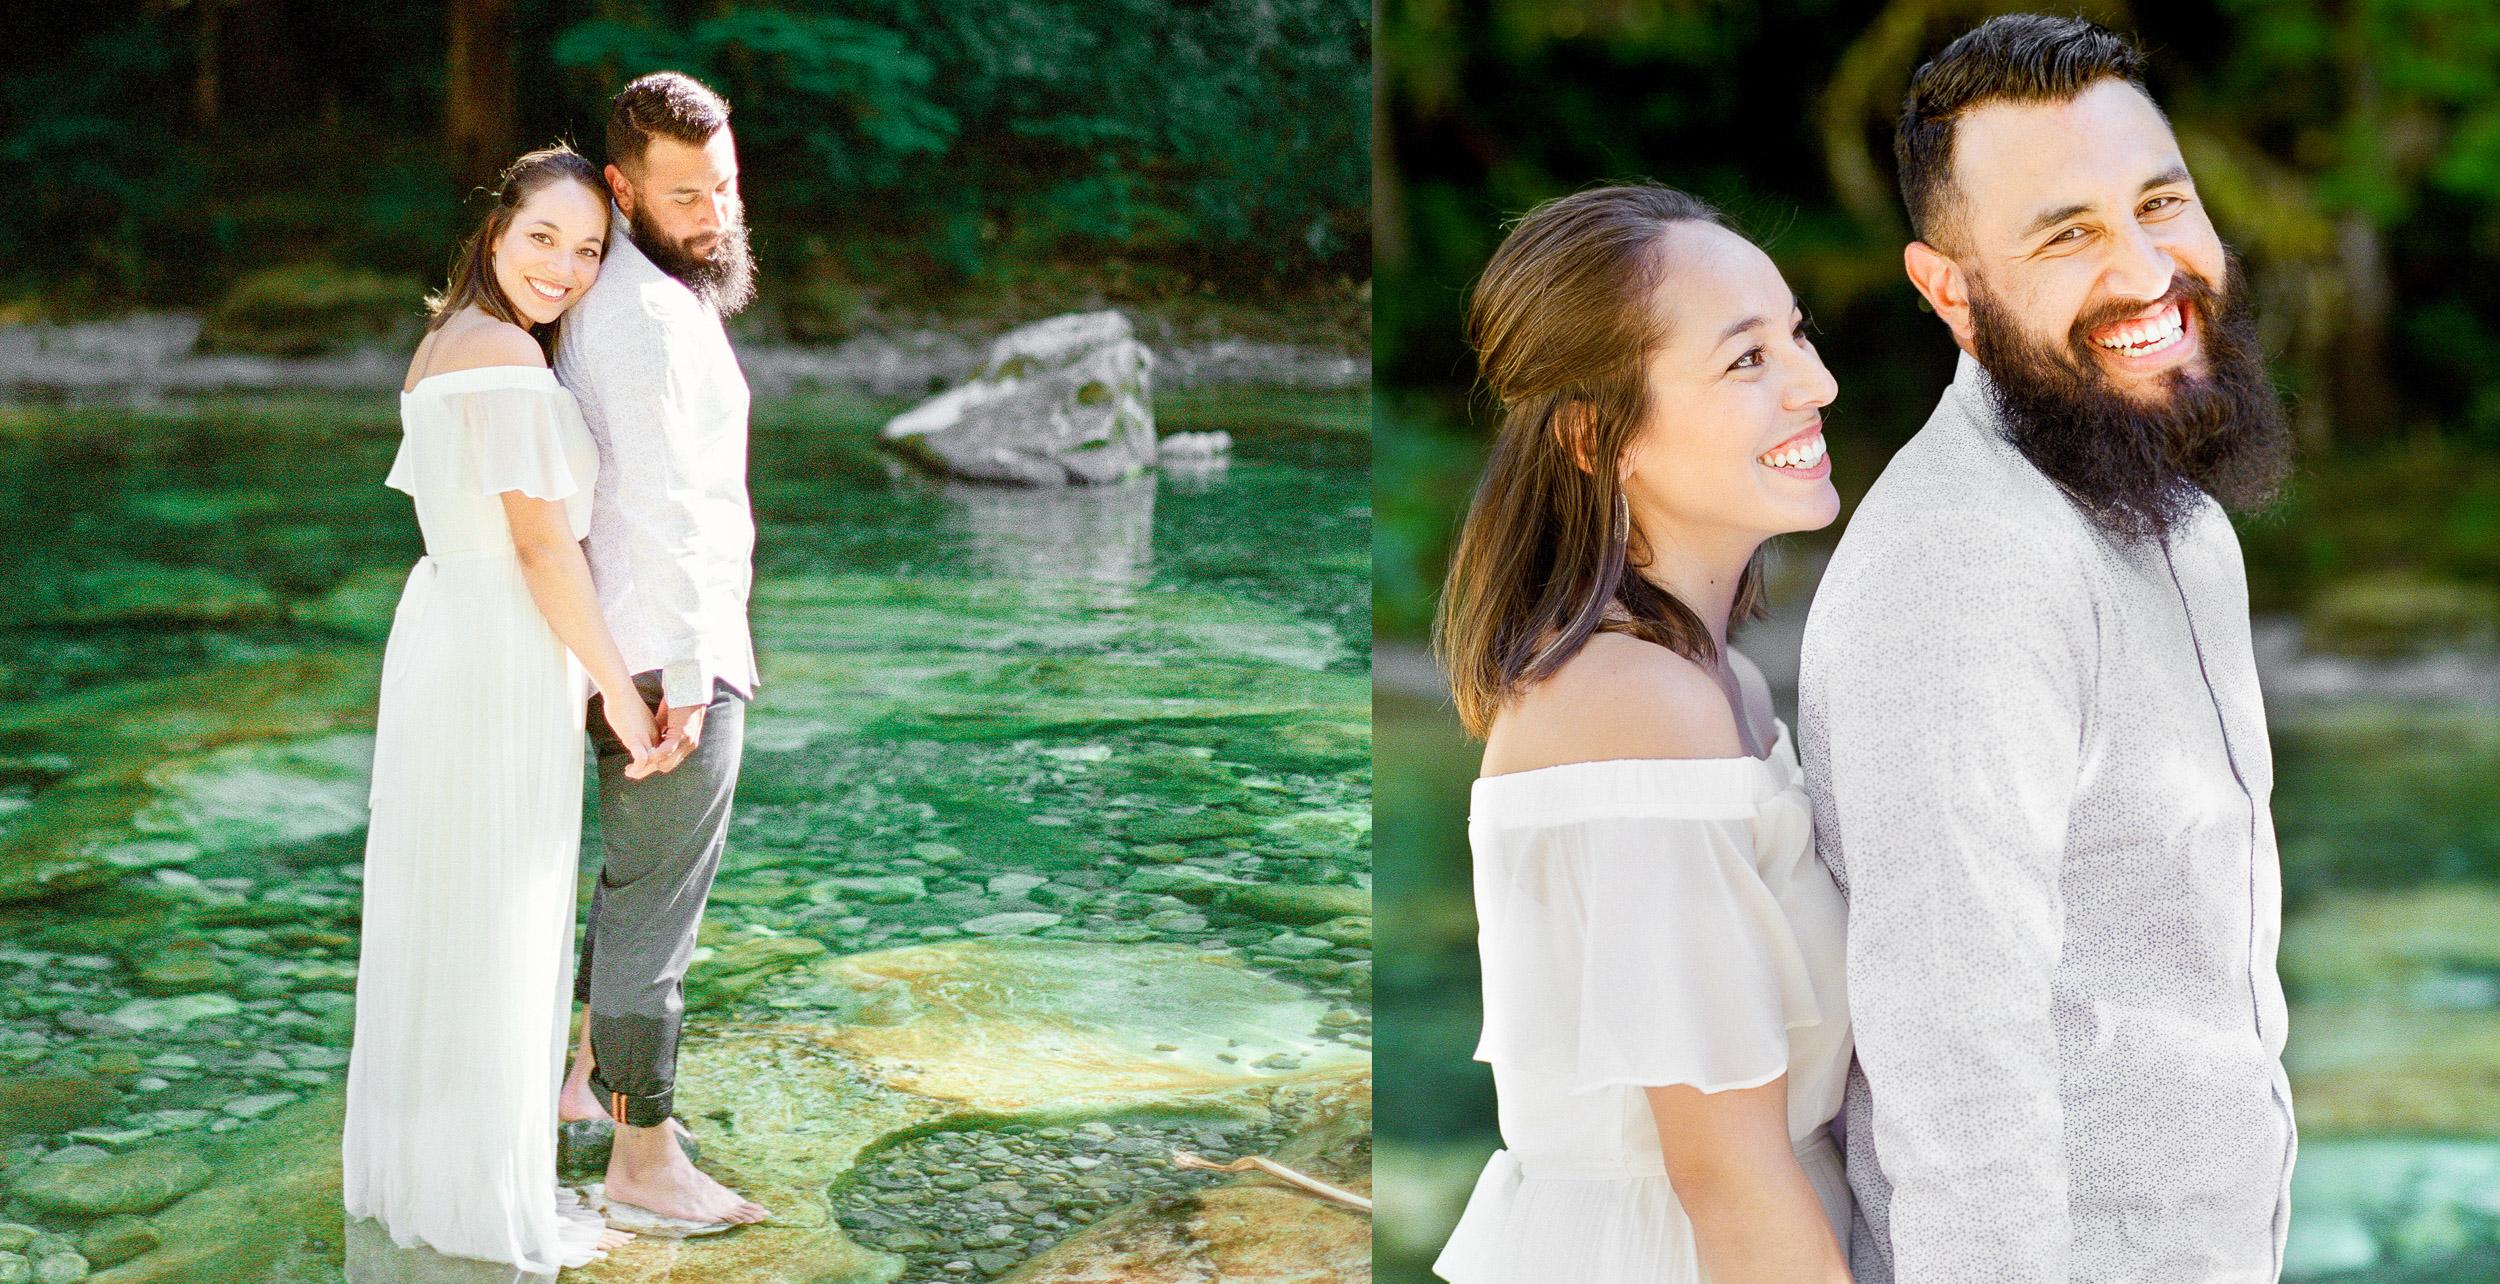 04_best+wedding+photographer+videographer+luxury+weddings+elopements_.jpg